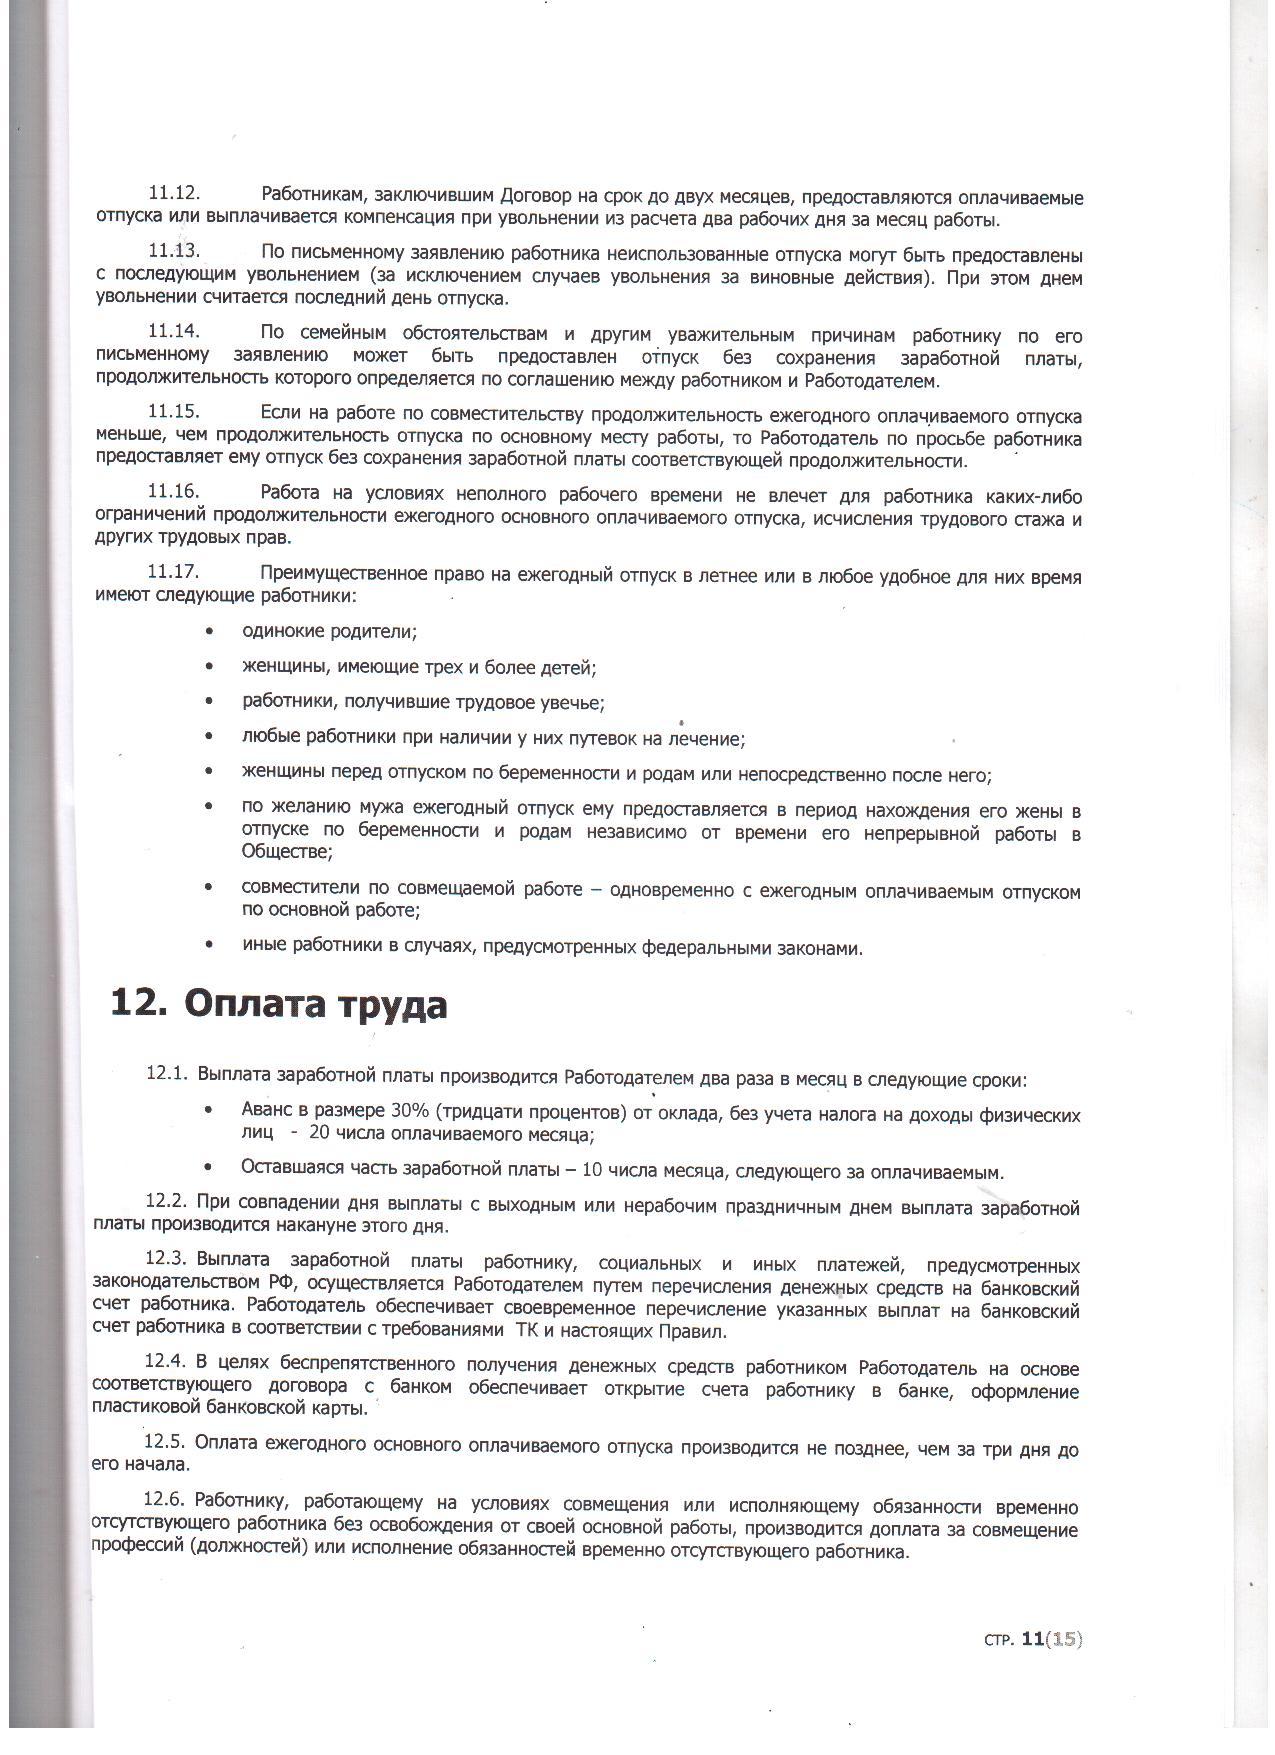 Правила внутреннего трудоговоро распорядка 11